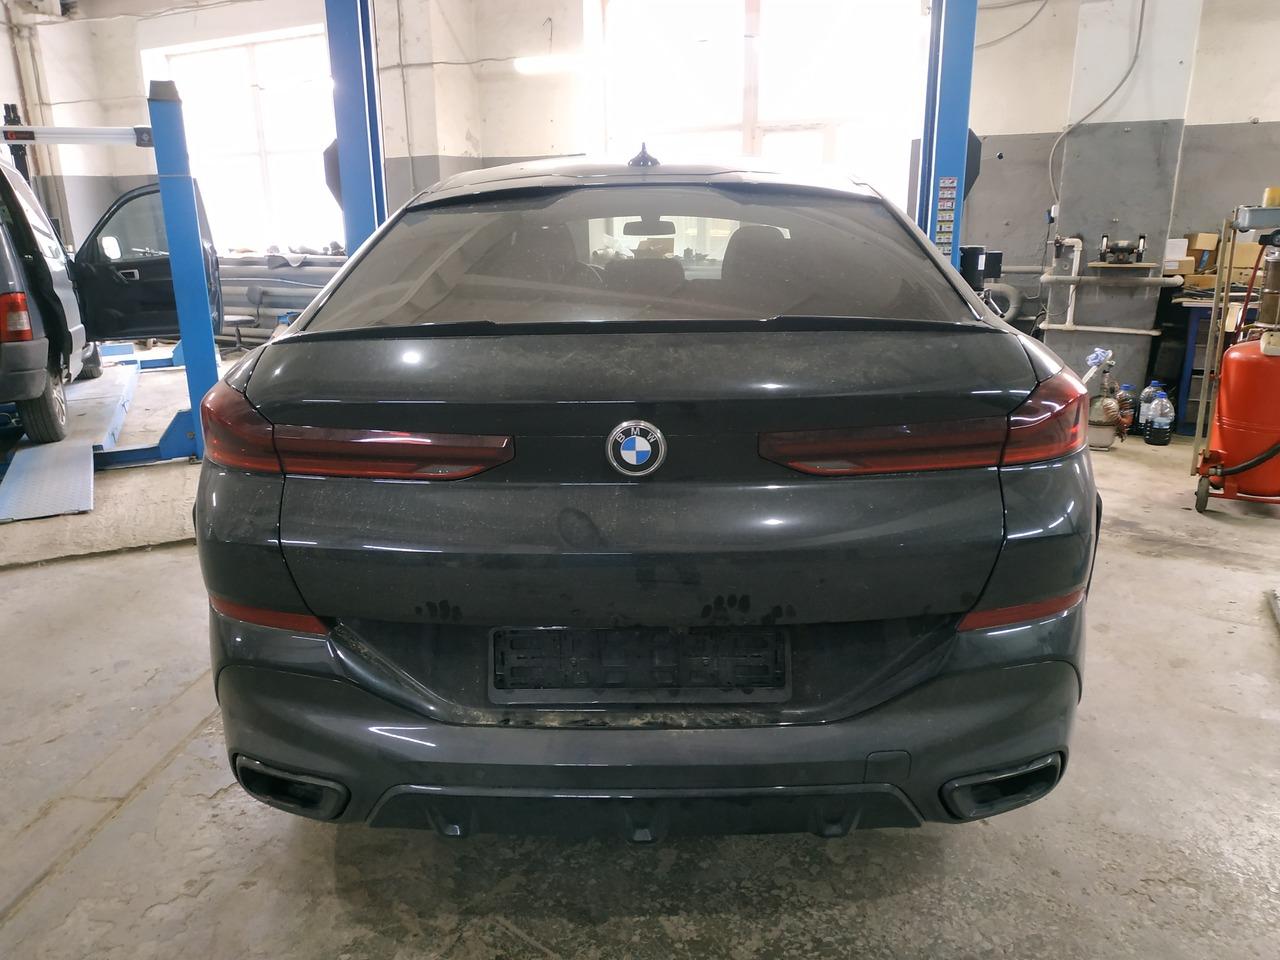 BMW X6 G06, вид сзади